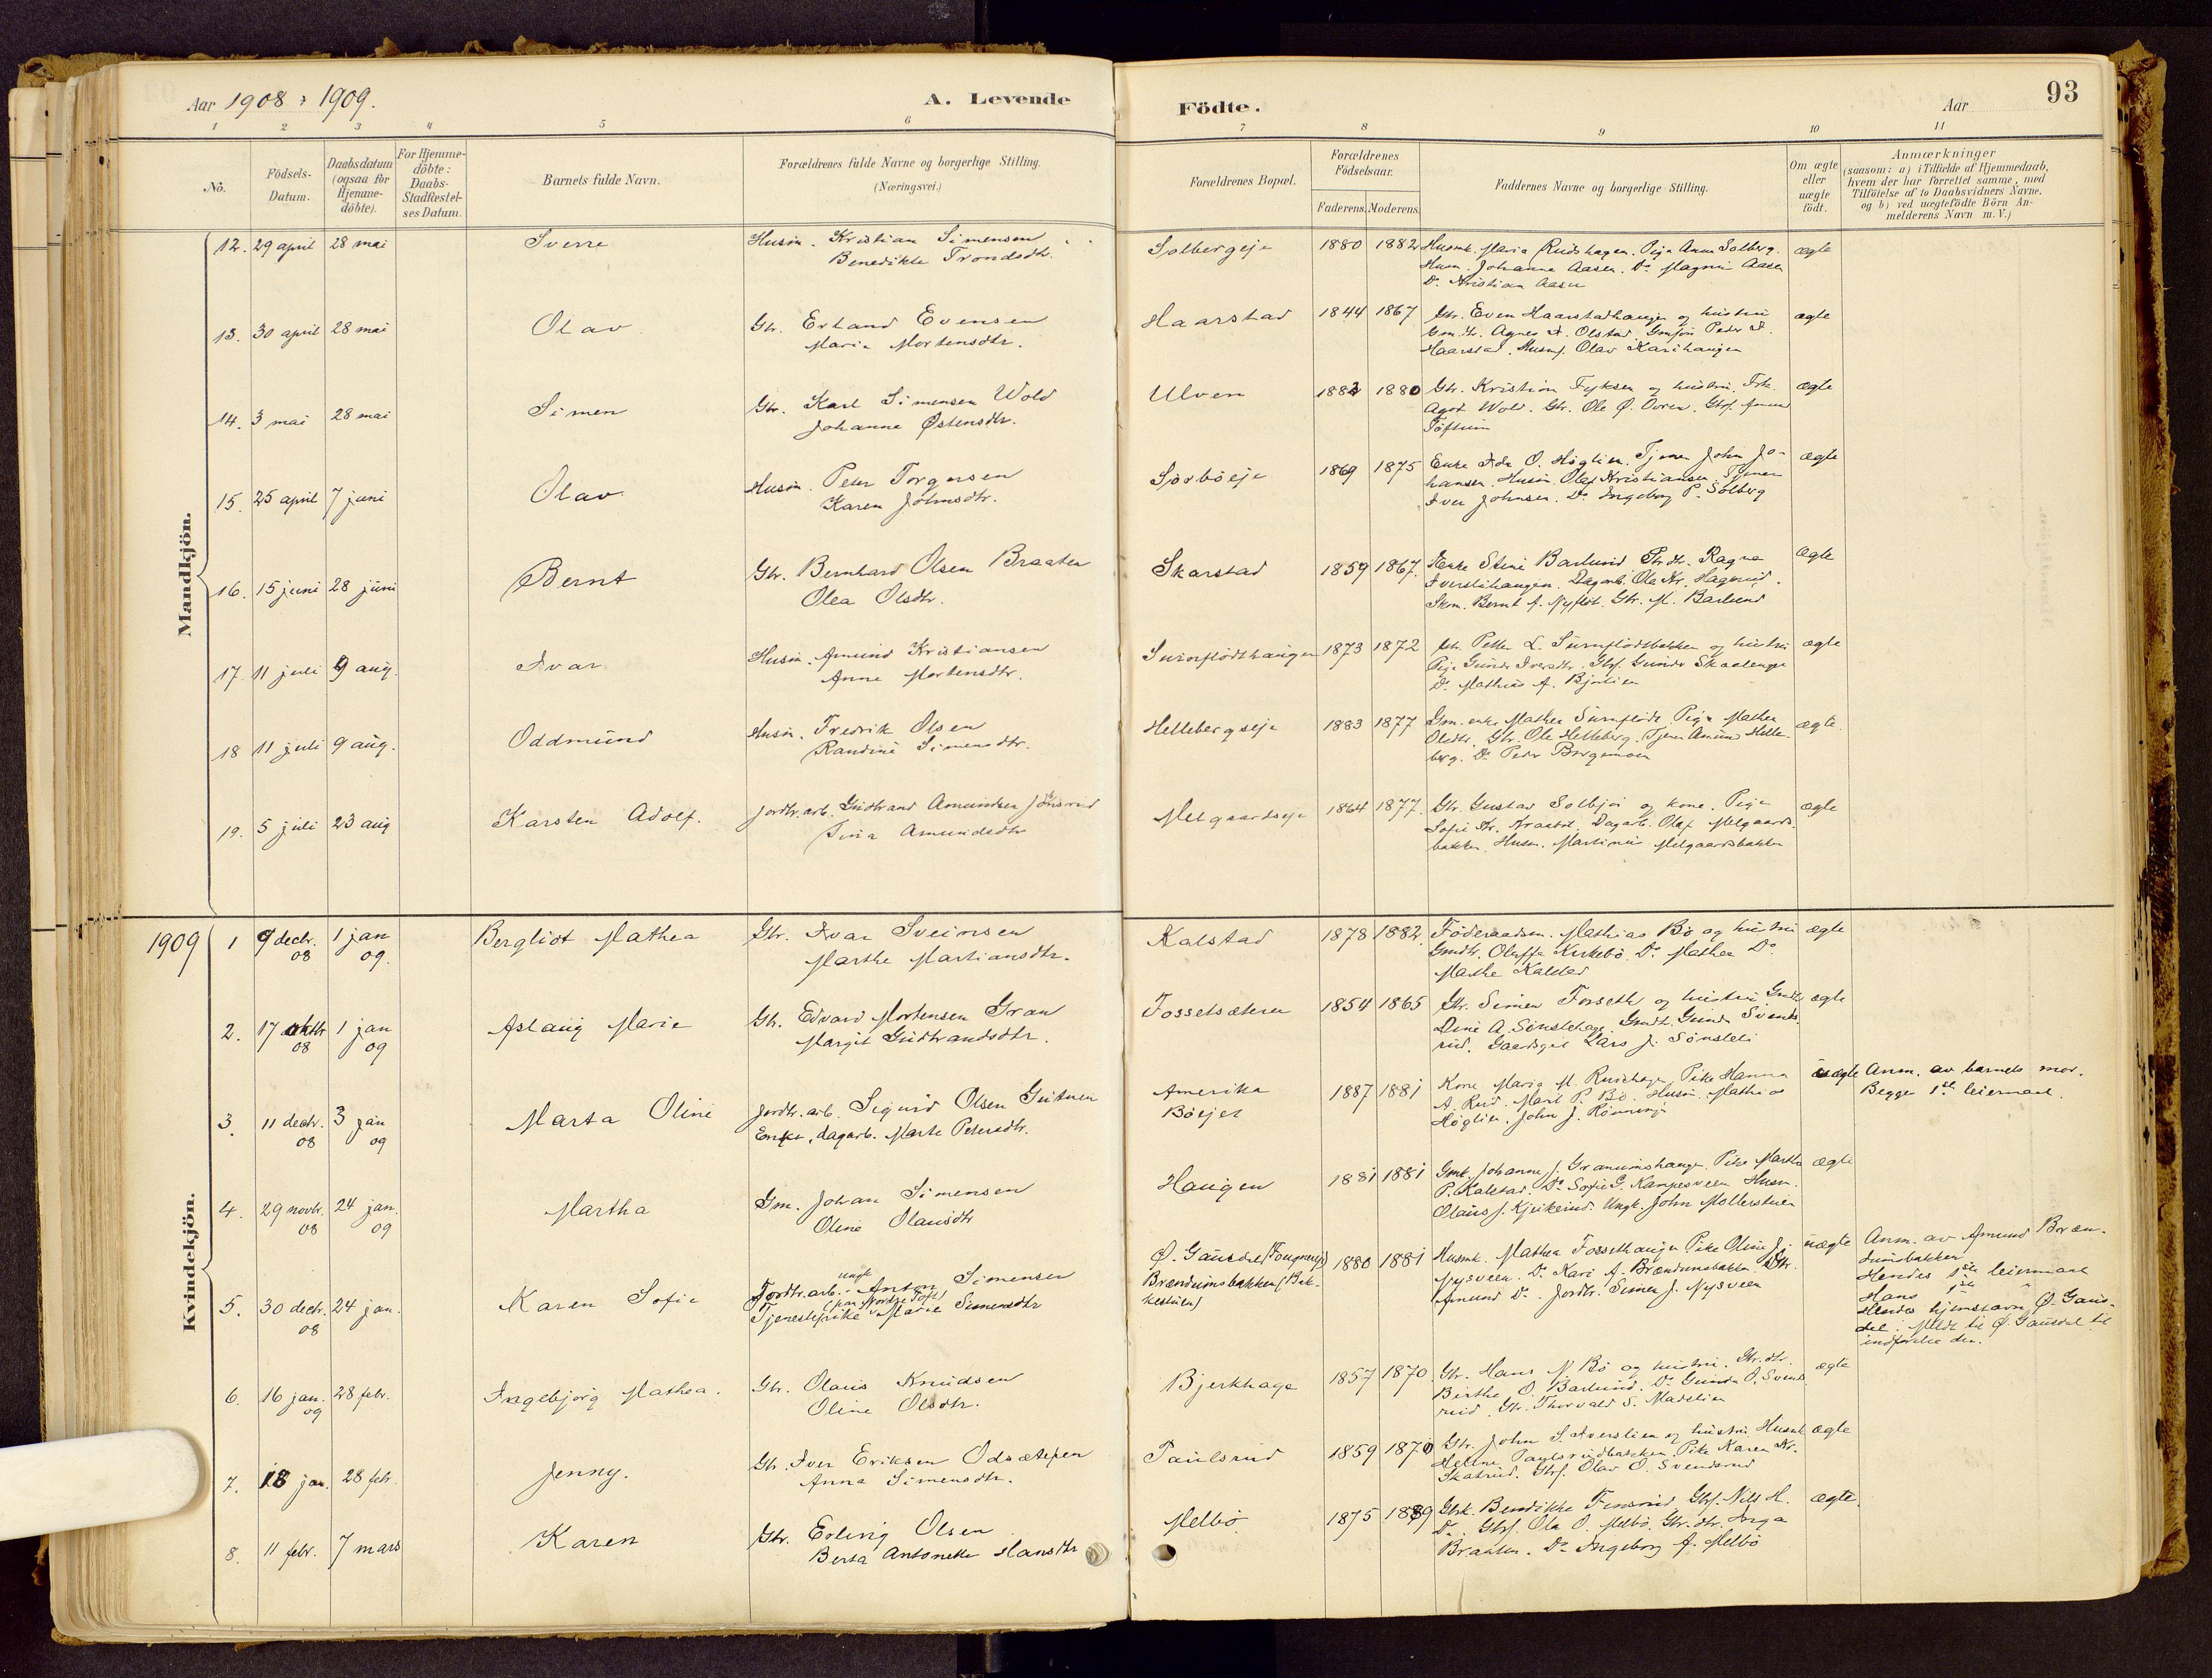 SAH, Vestre Gausdal prestekontor, Ministerialbok nr. 1, 1887-1914, s. 93